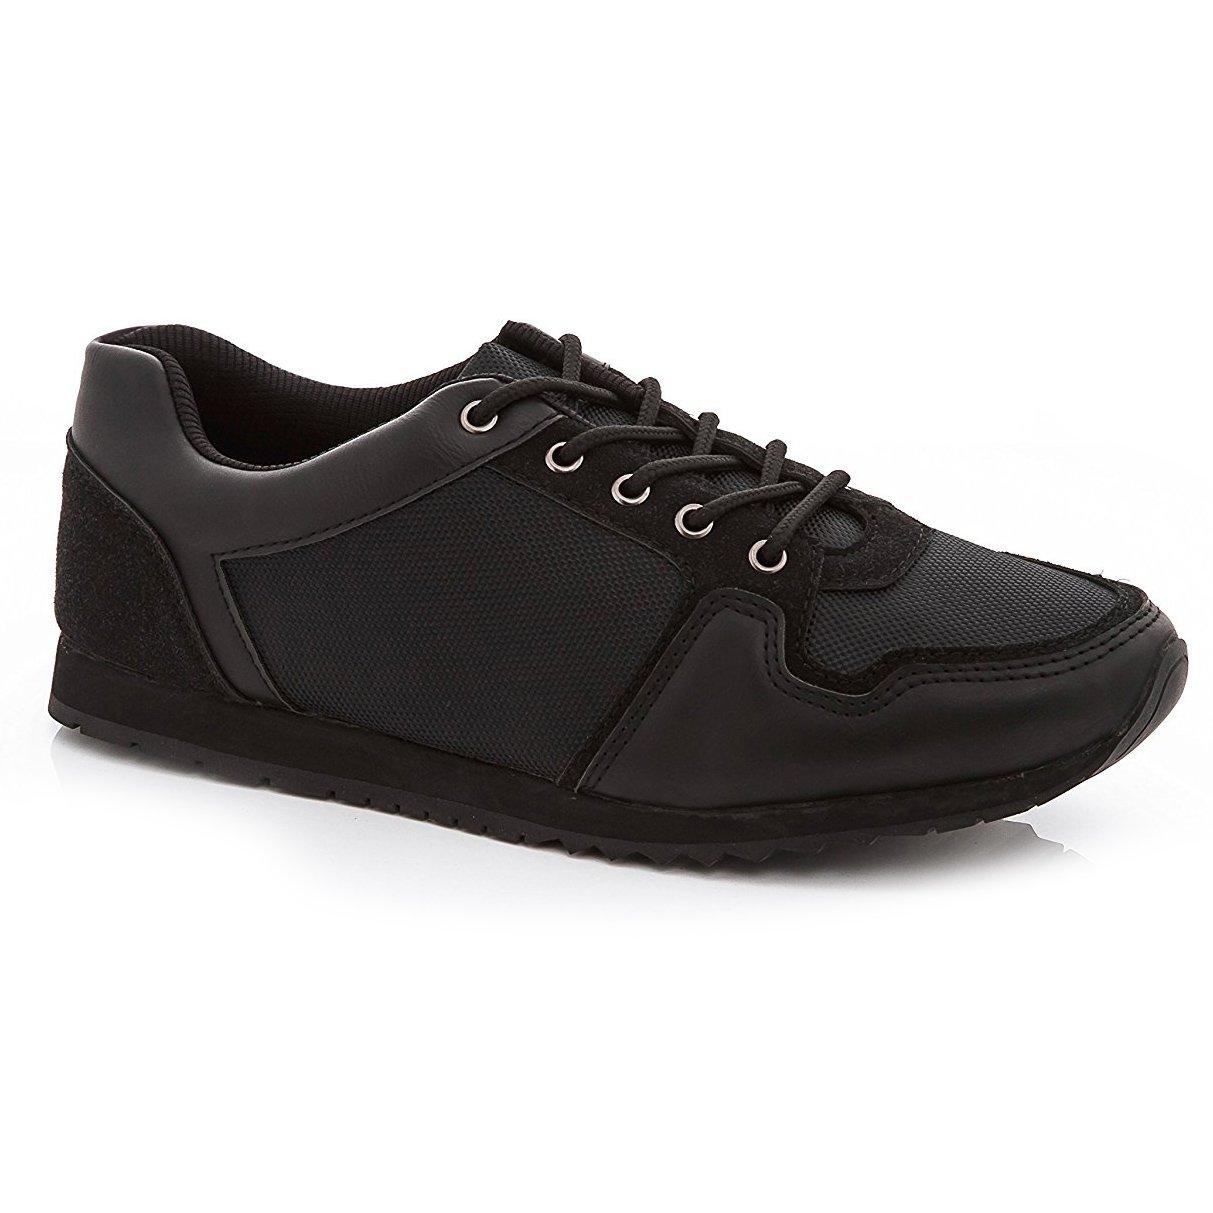 Franco Vanucci Mens 9994 Lace Up Sneakers Black Black Size 11